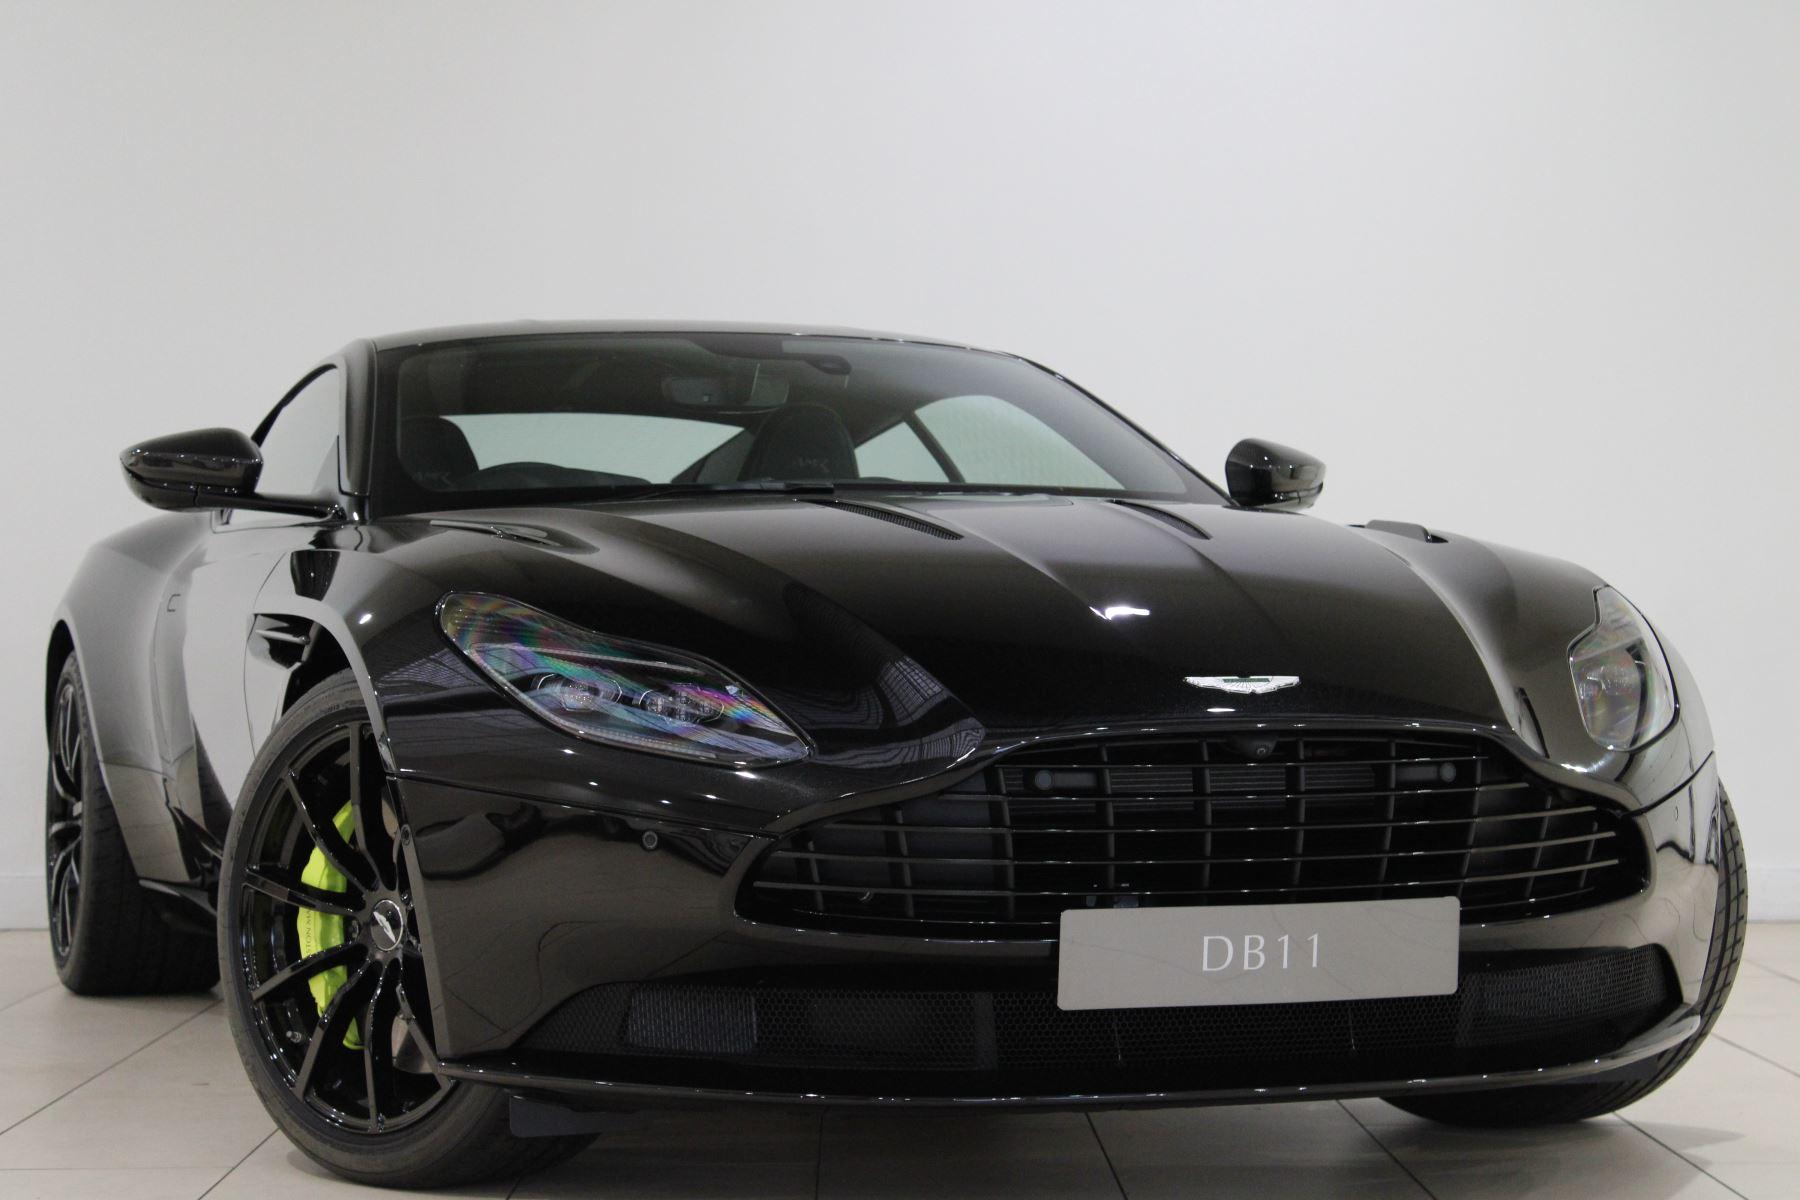 Aston Martin DB11 AMR Touchtronic image 13